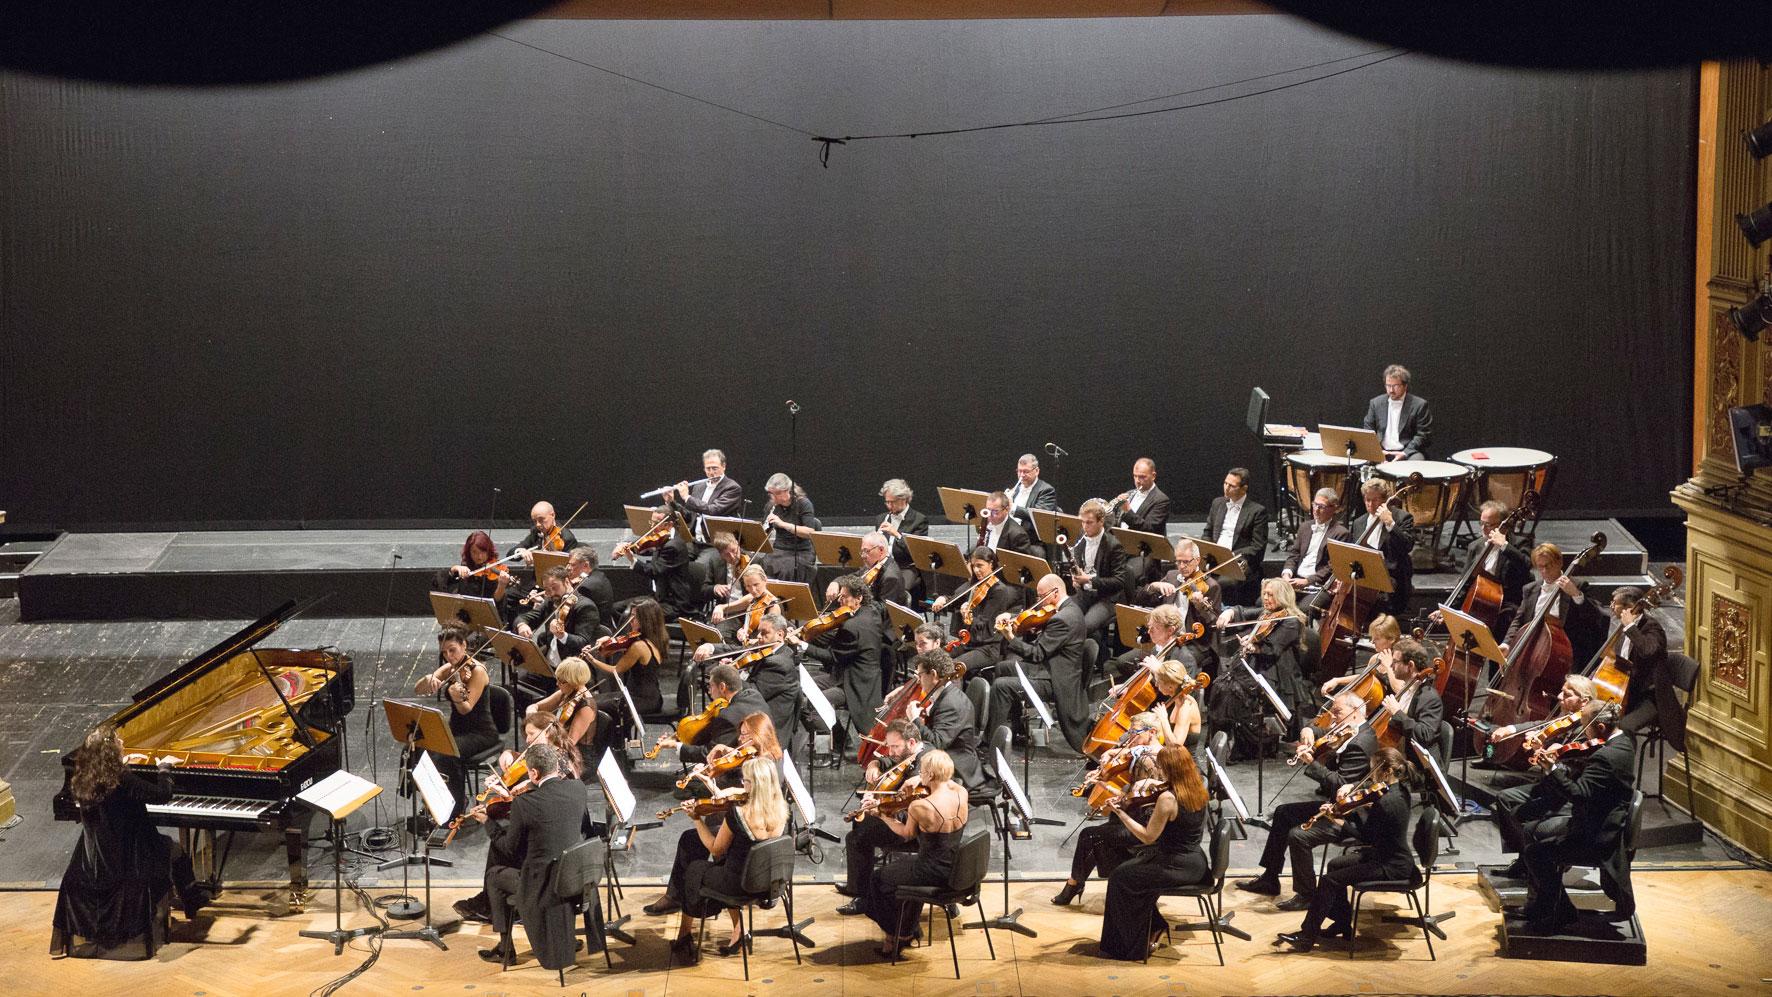 concerto stagione sinfonica teatro Verdi Trieste